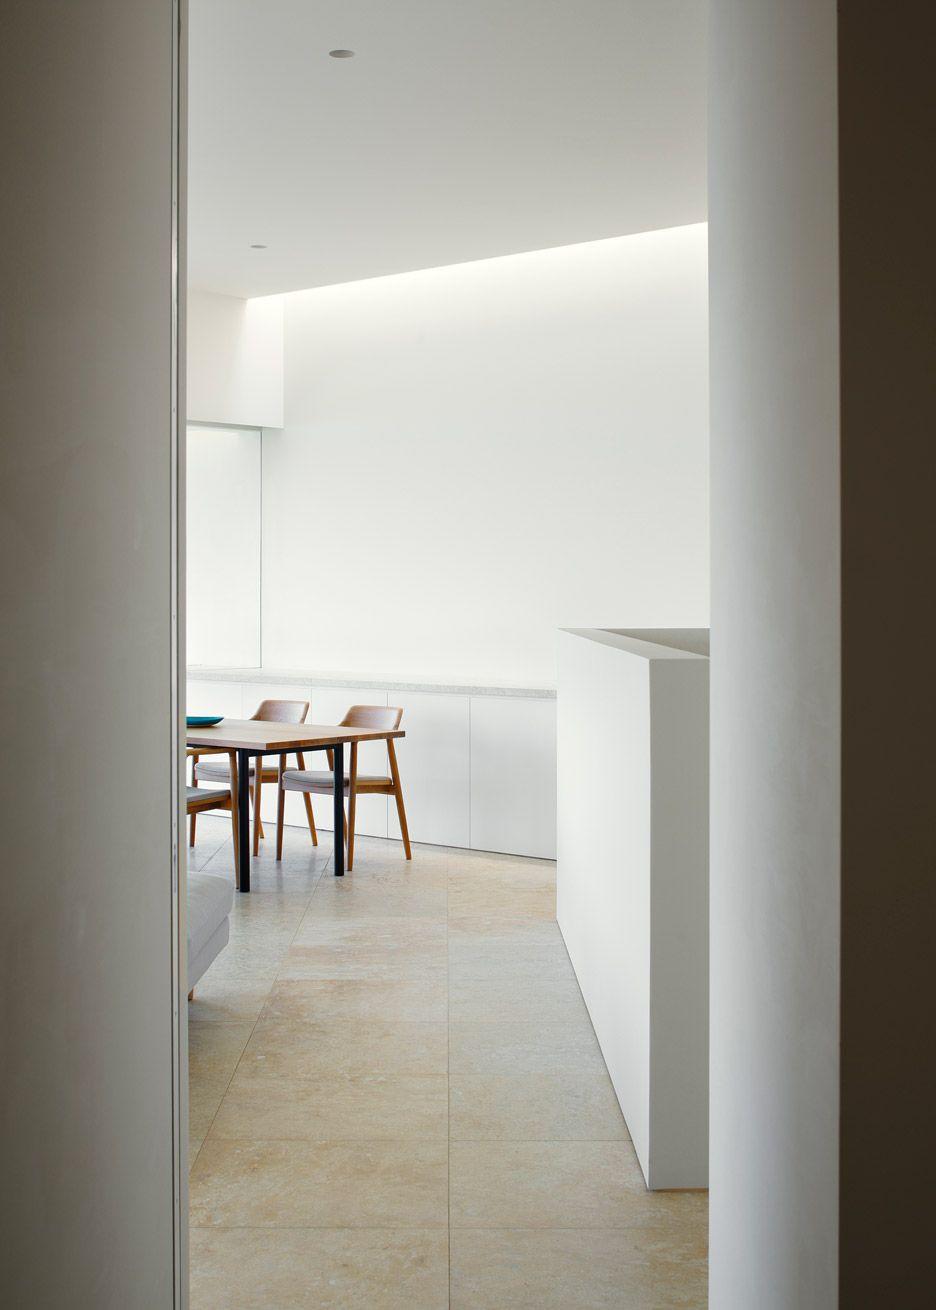 john pawson creates bright white holiday home on okinawa john